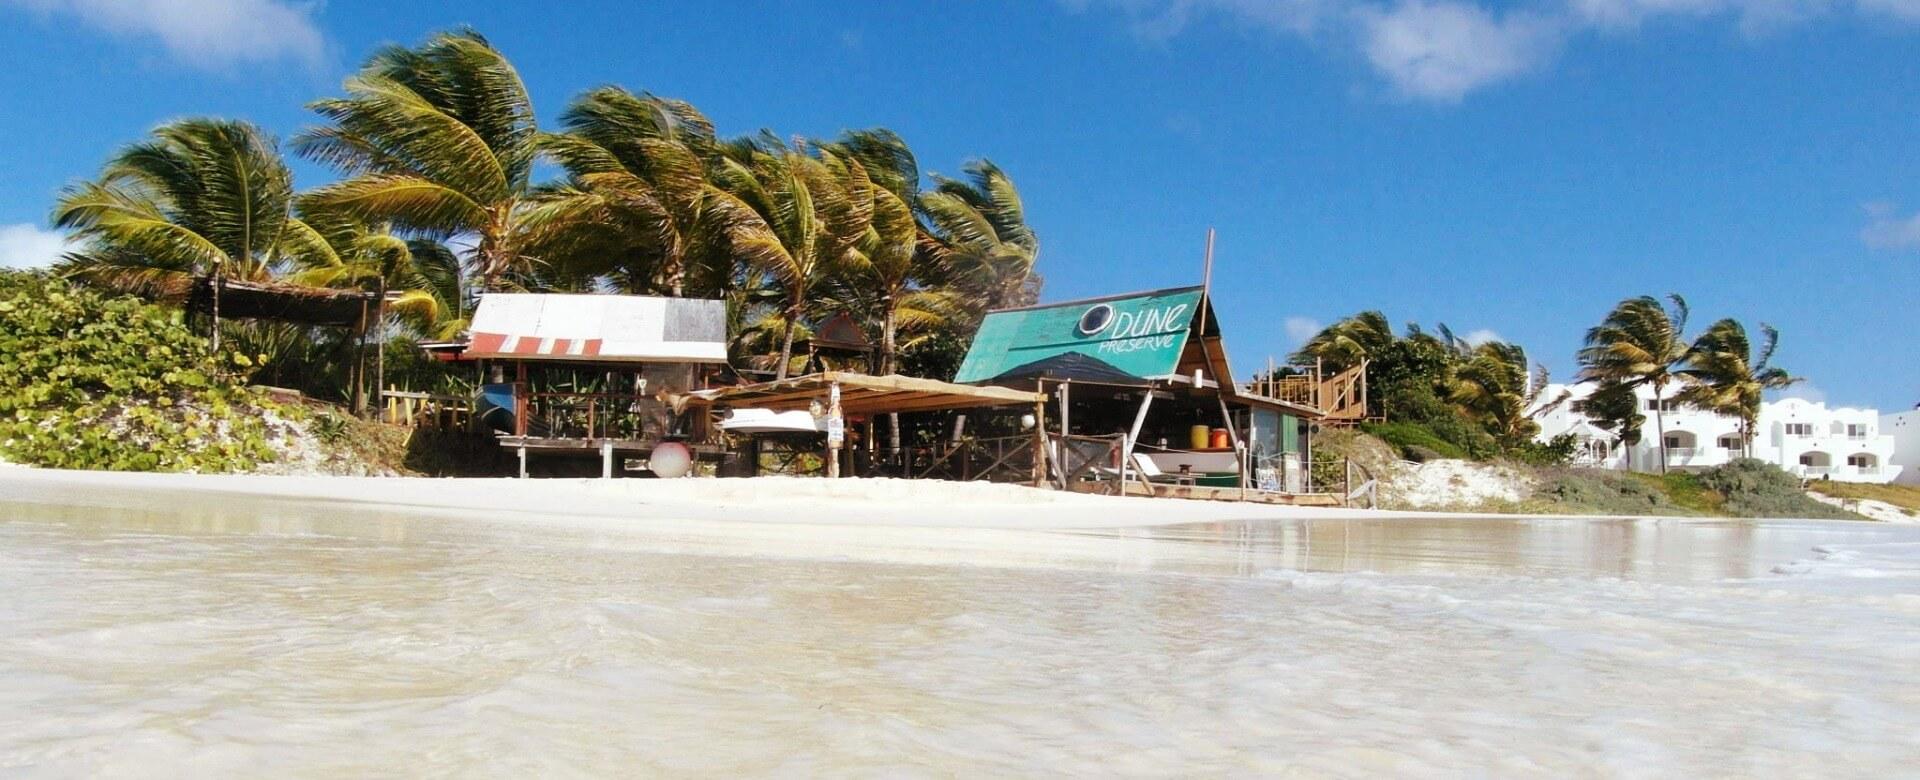 #1 Caribbean beach bar Dune Preserve